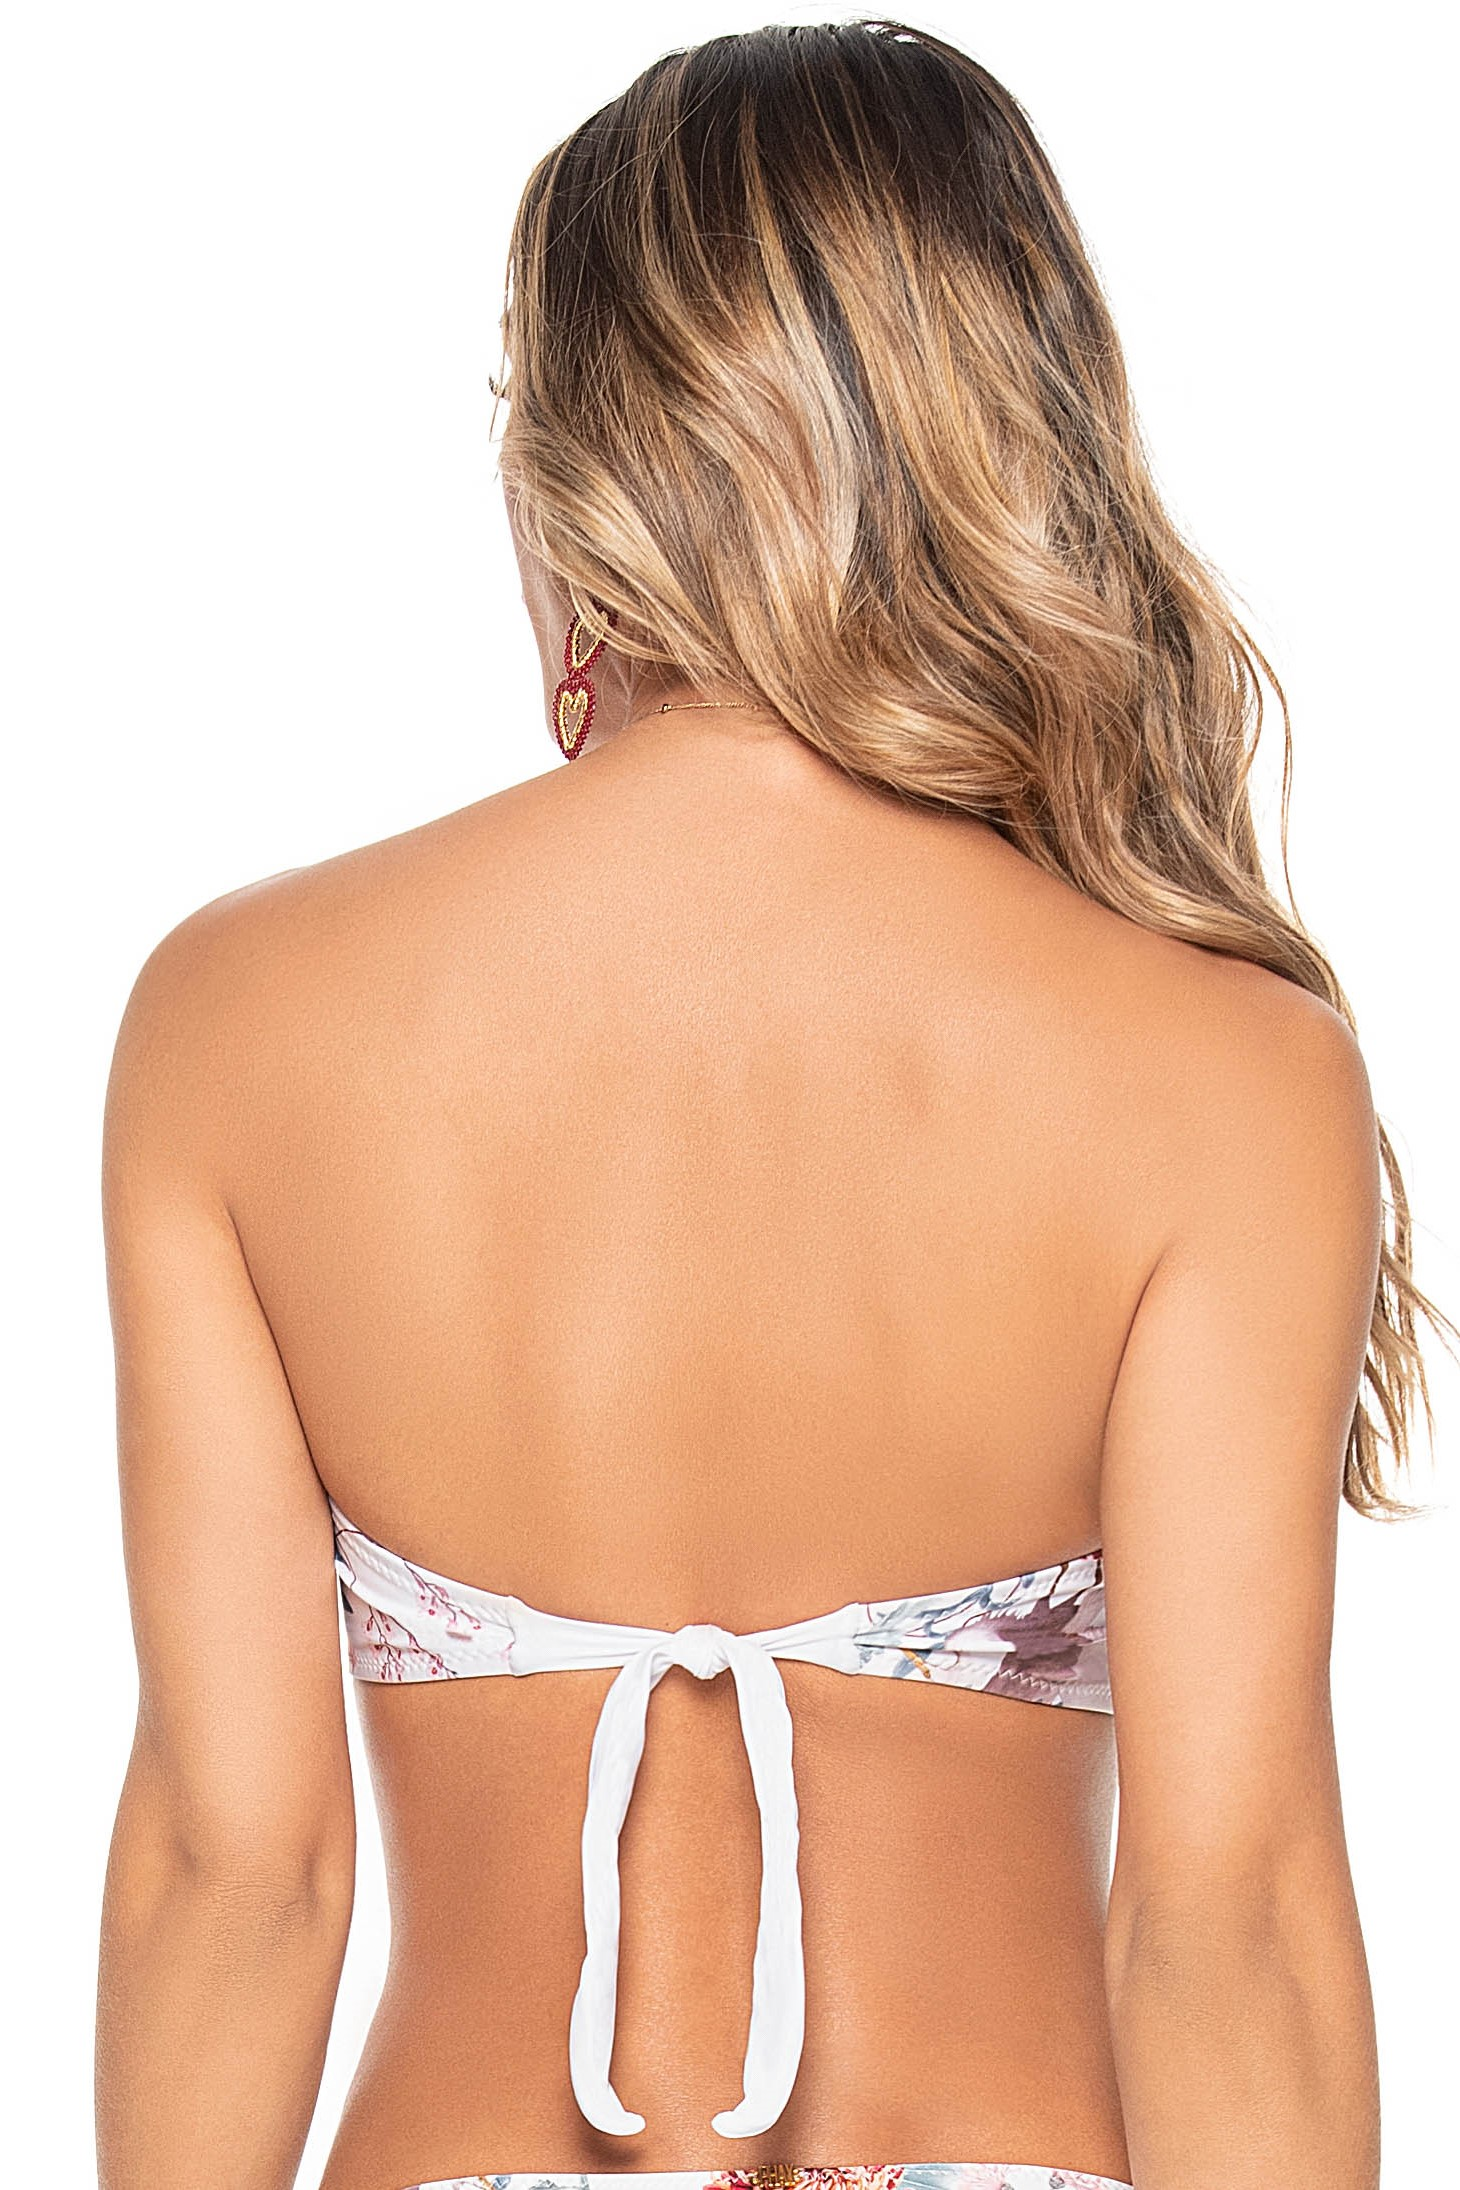 Phax Bella Paris Strapless Bikini Top